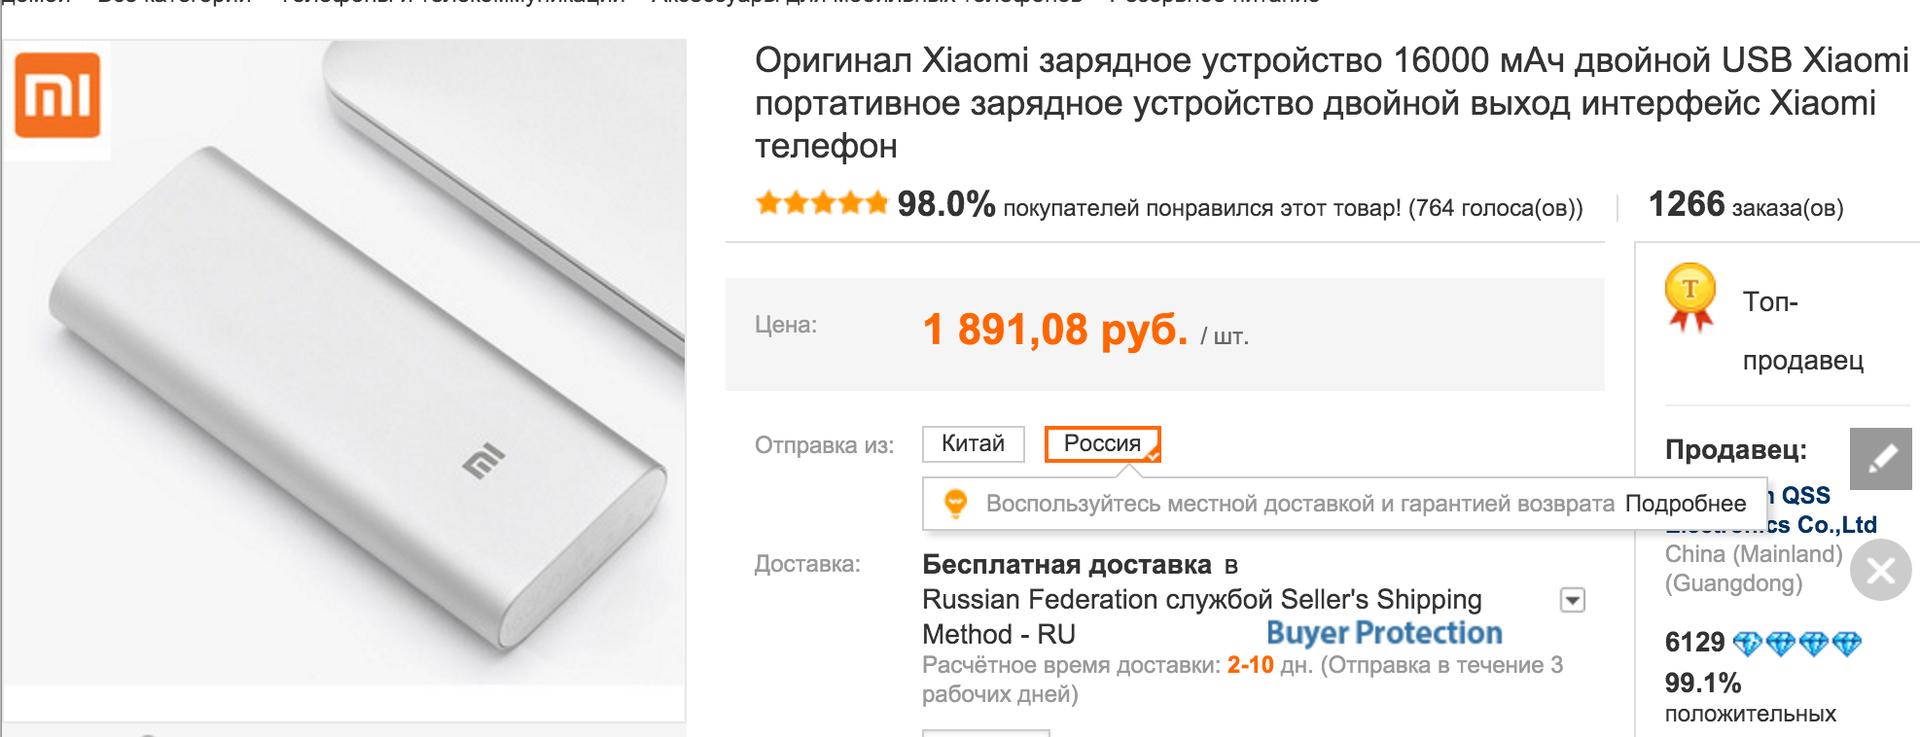 DIY PowerBank на 17000 честных миллиампер-часов - 1